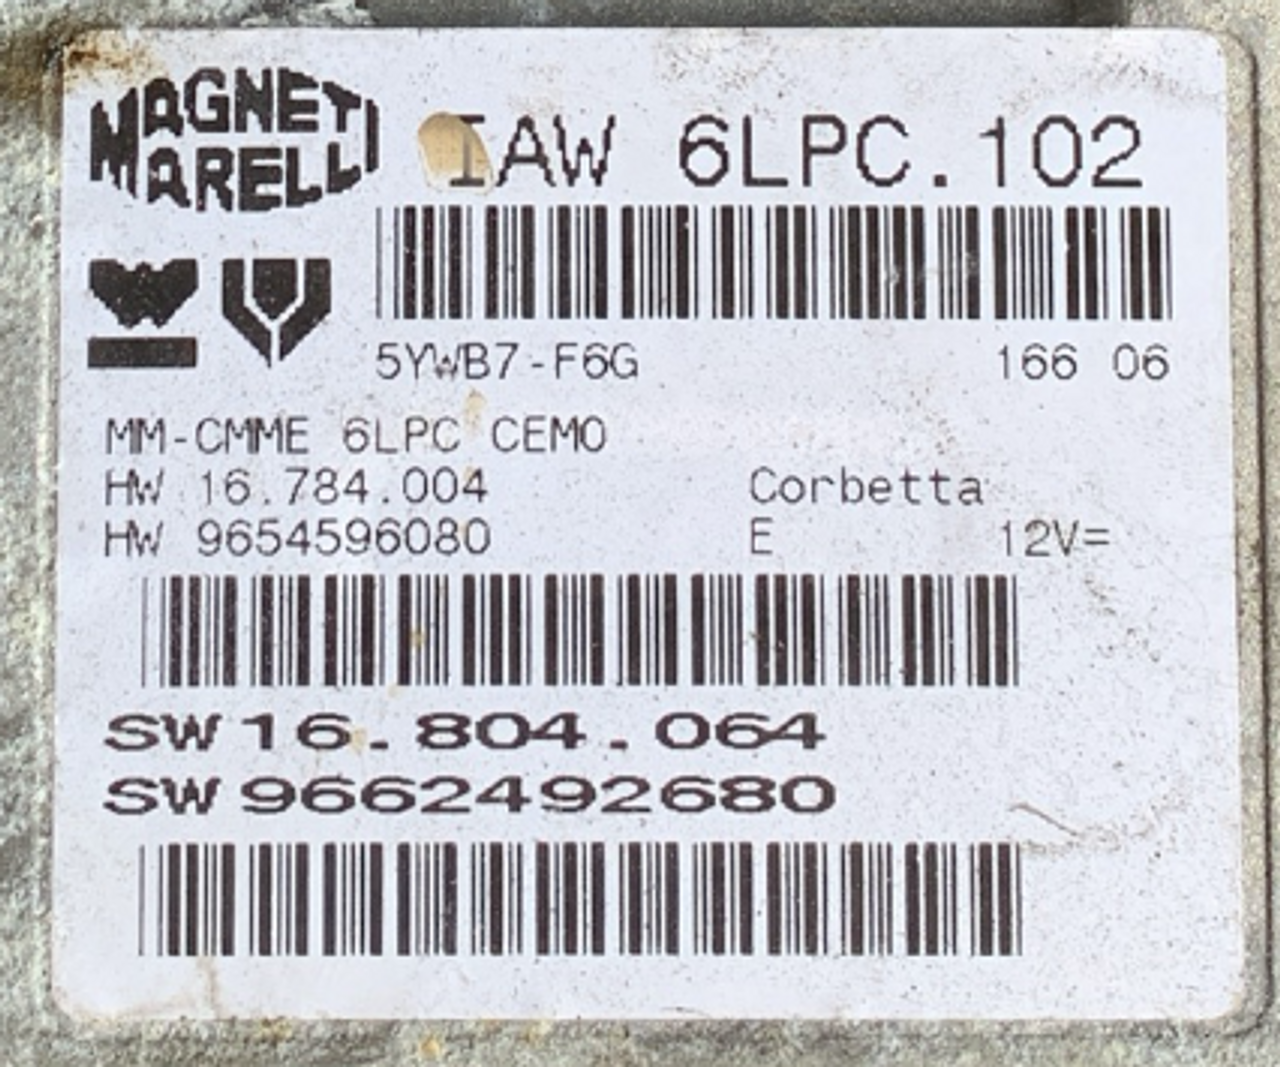 Magneti Marelli, IAW 6LPC.102, HW 16784004, HW 9654596080, SW 16803064, SW 9662492680